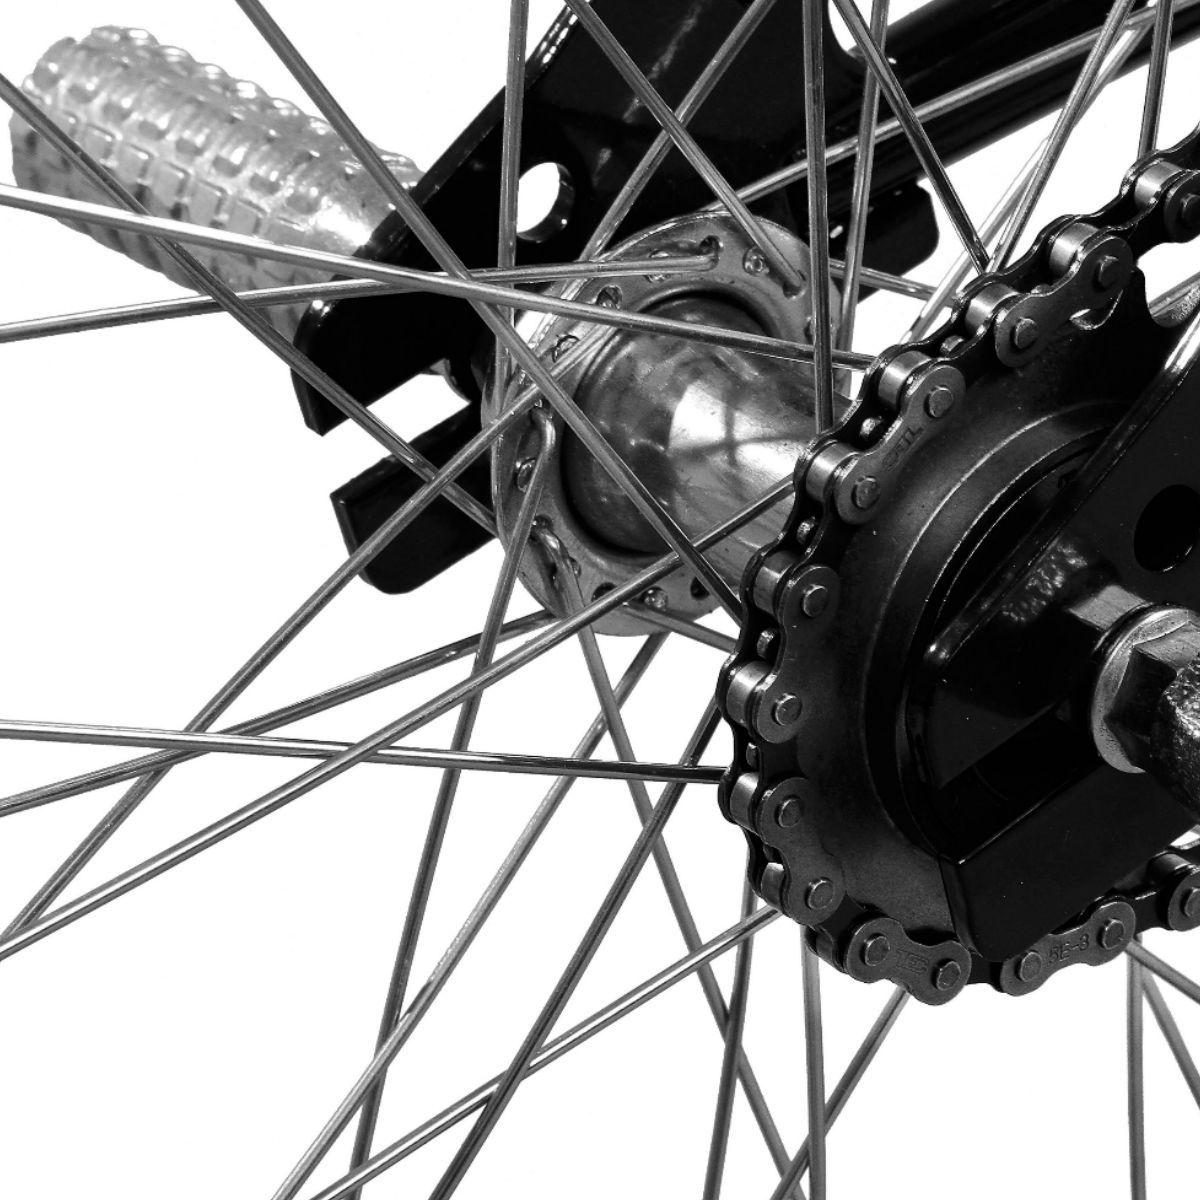 Bicicleta Master Bike Aro 20 Jump A-36 V-Brake Aro Aero Preto